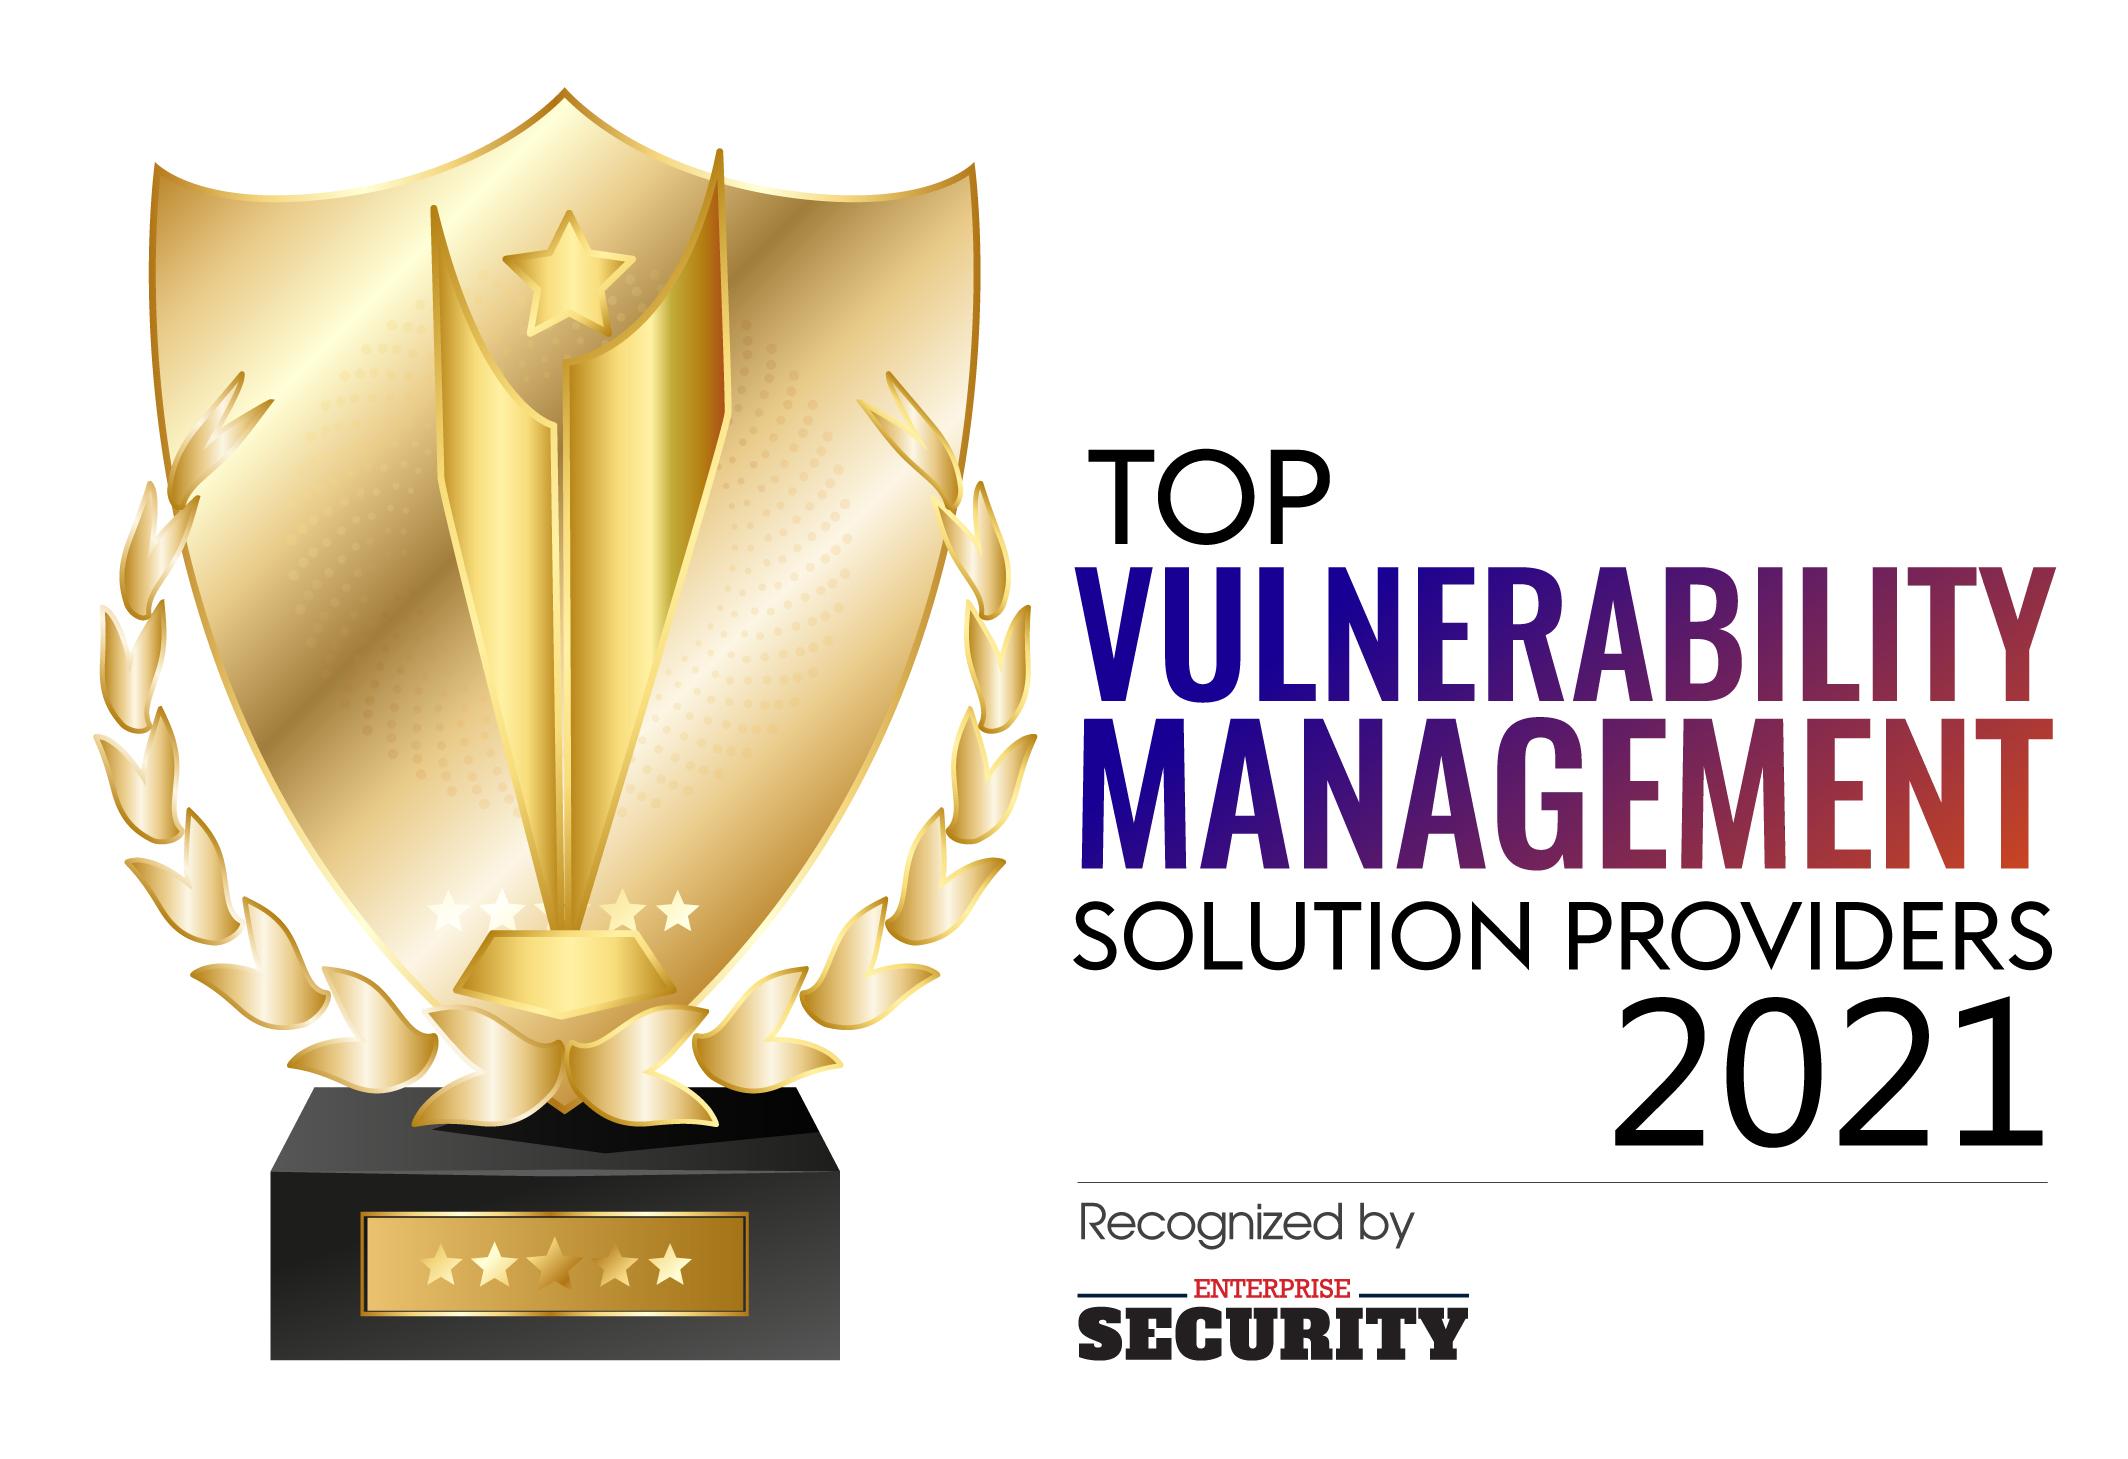 Top 10 Vulnerability Management Solution Companies - 2021